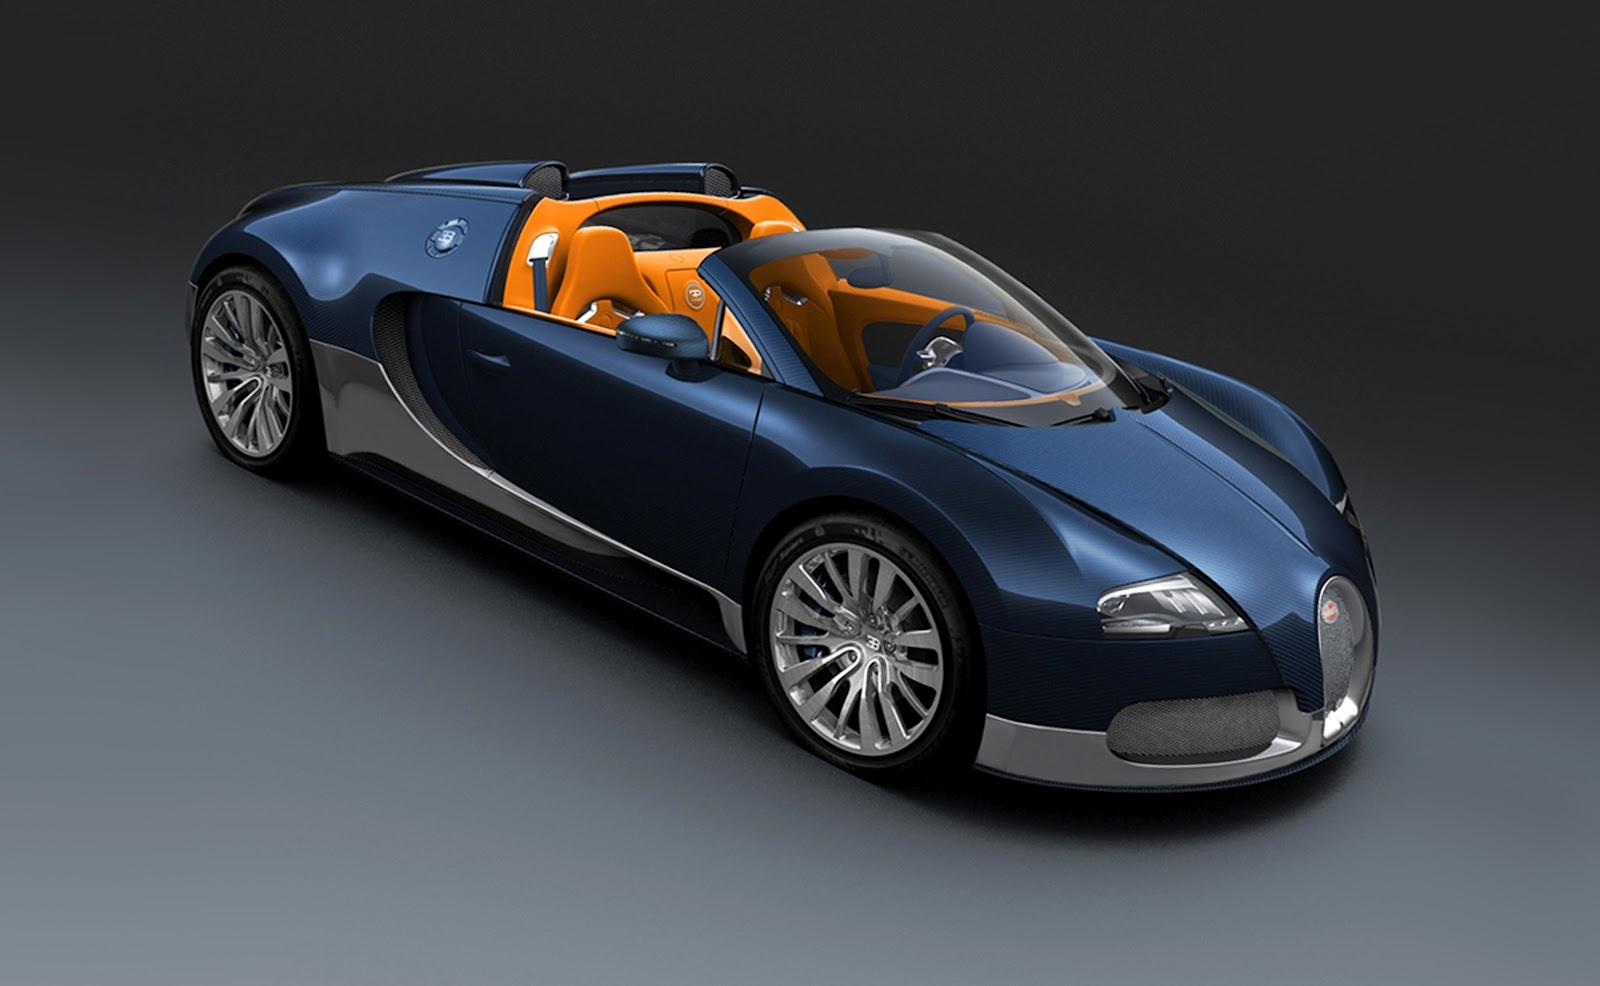 DSNG'S SCI FI MEGAVERSE: CONCEPT CARS - THE CIEL, THE CIEN, THE MCLAREN F1 & THE BUGATTI